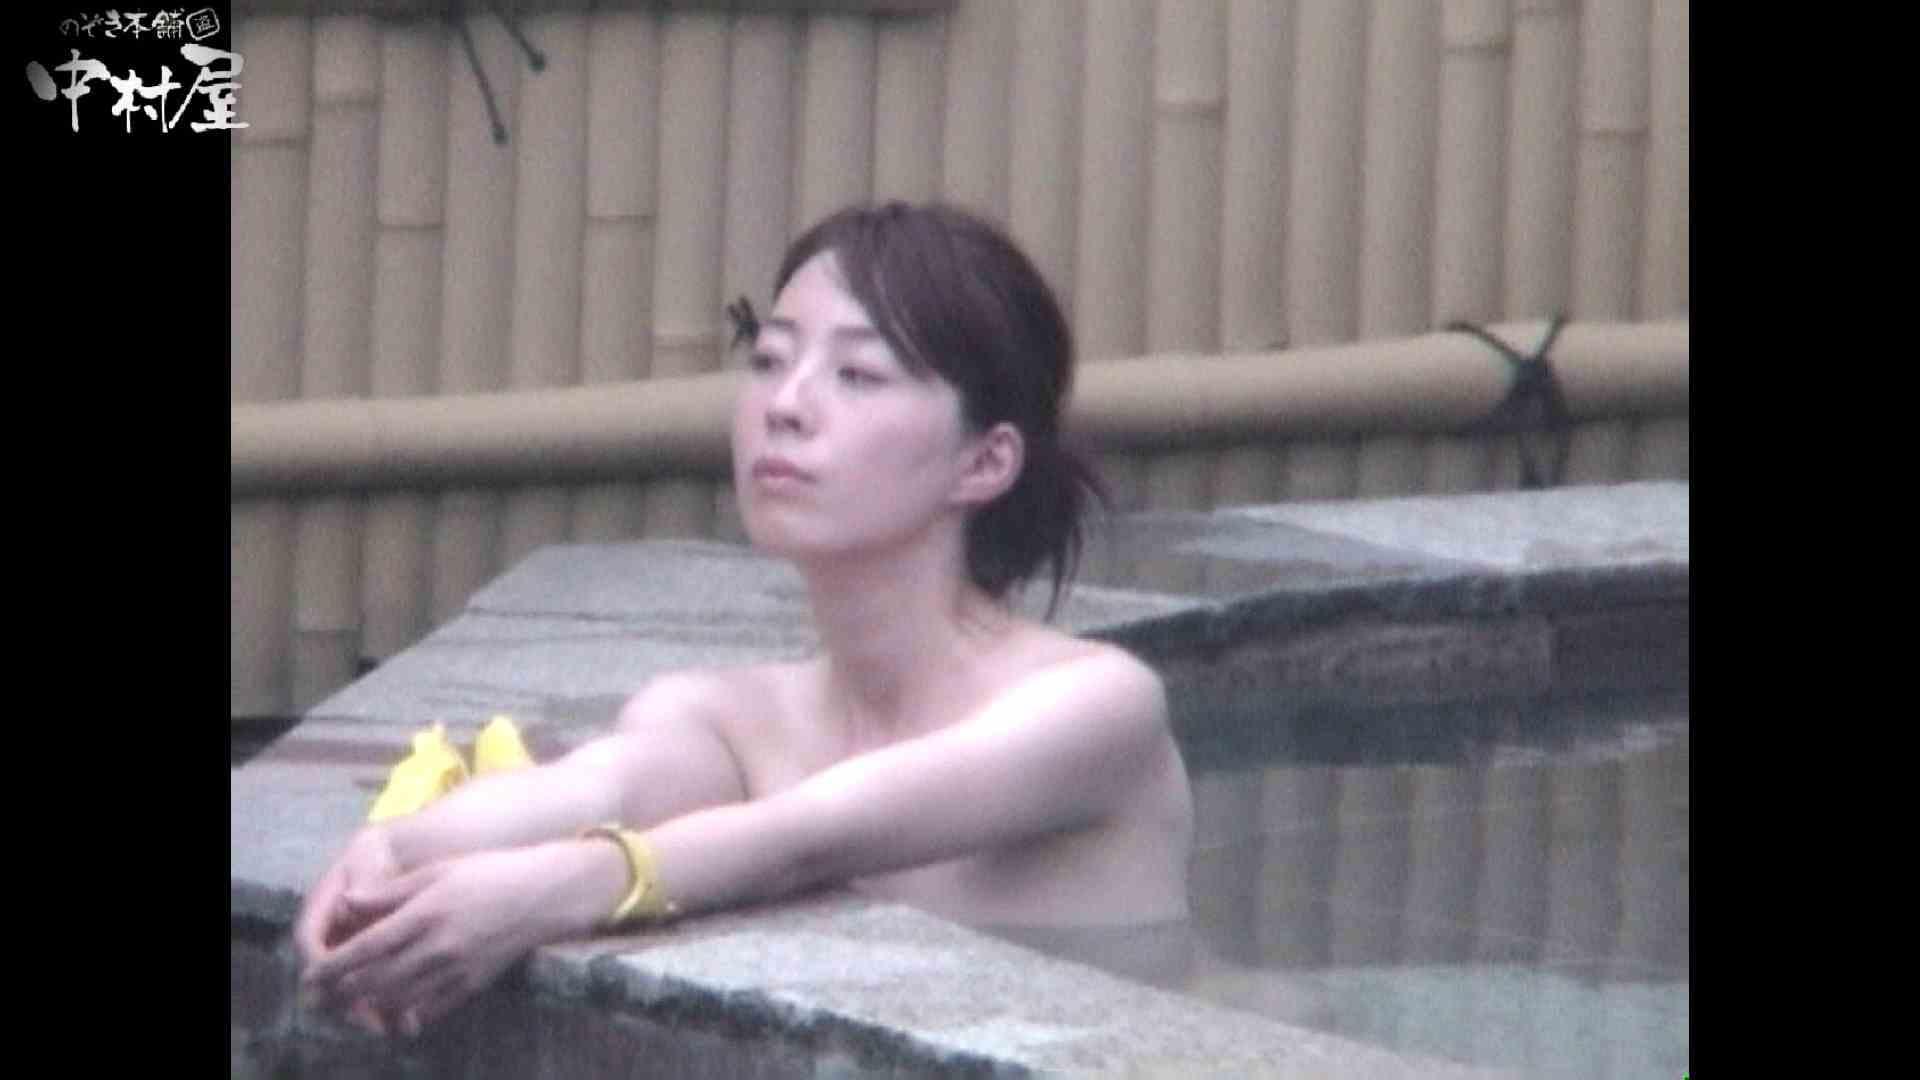 Aquaな露天風呂Vol.964 露天風呂編  112PIX 112